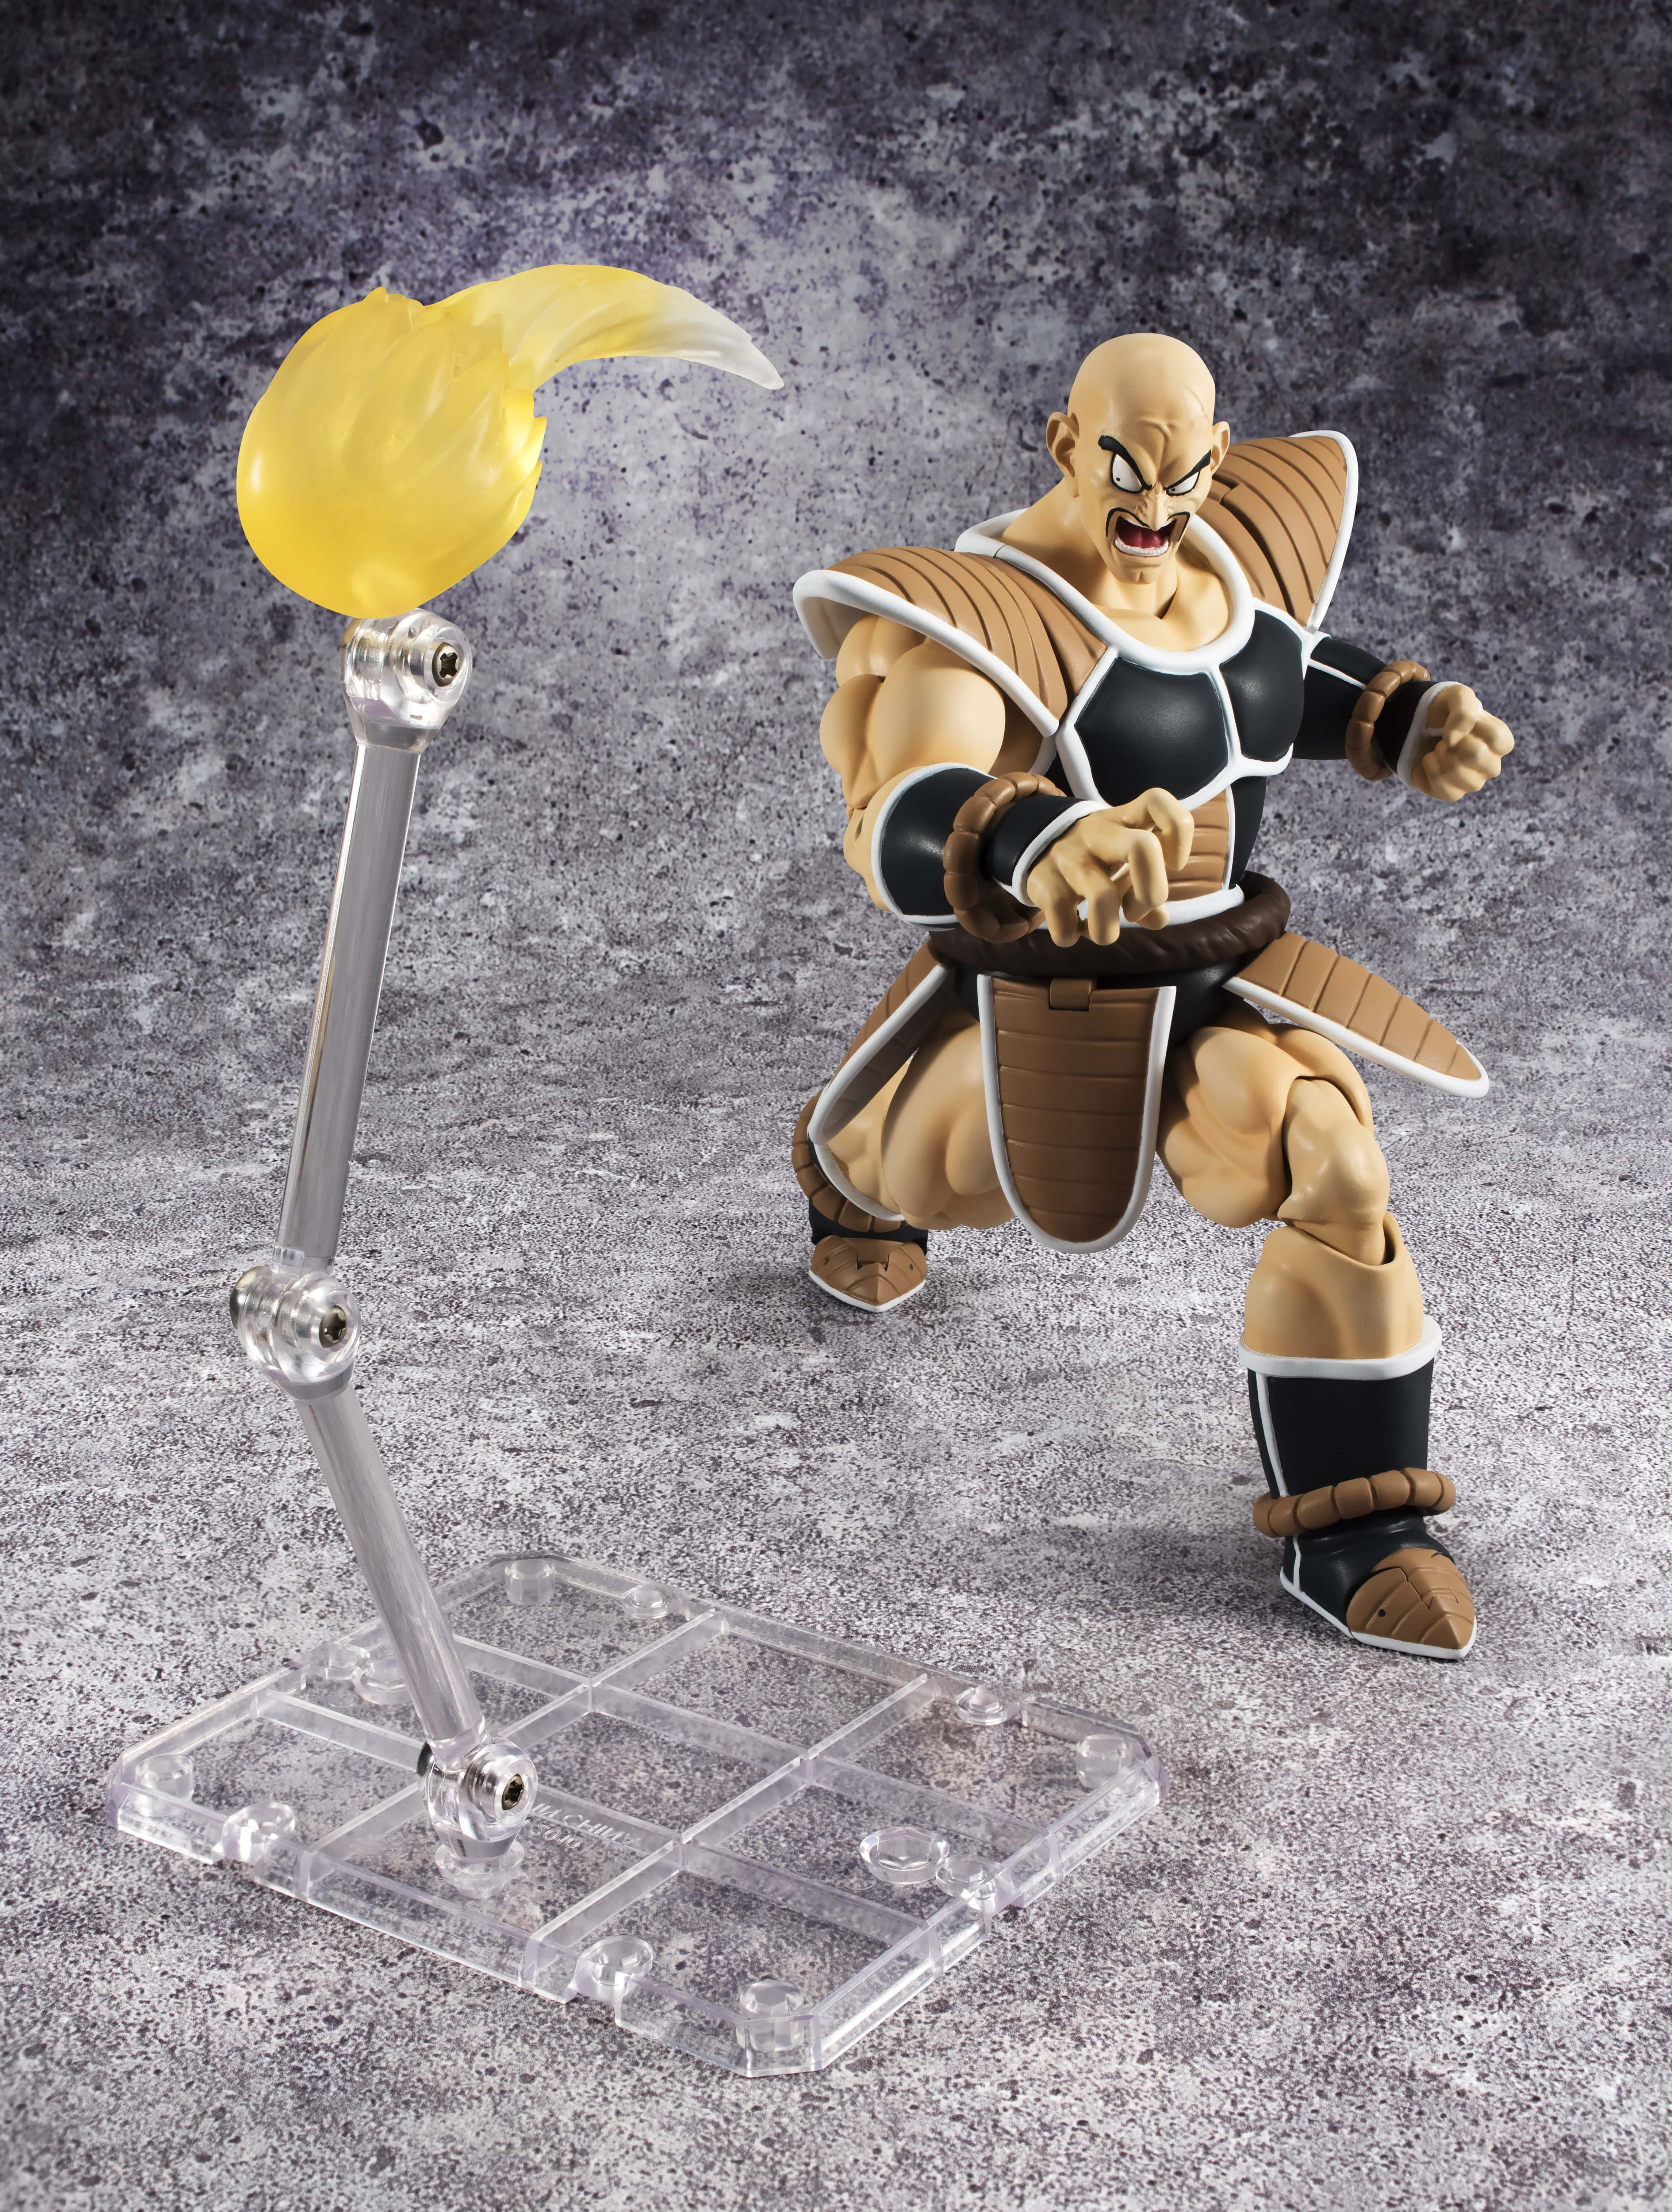 Nappa Dragon Ball Z Figure